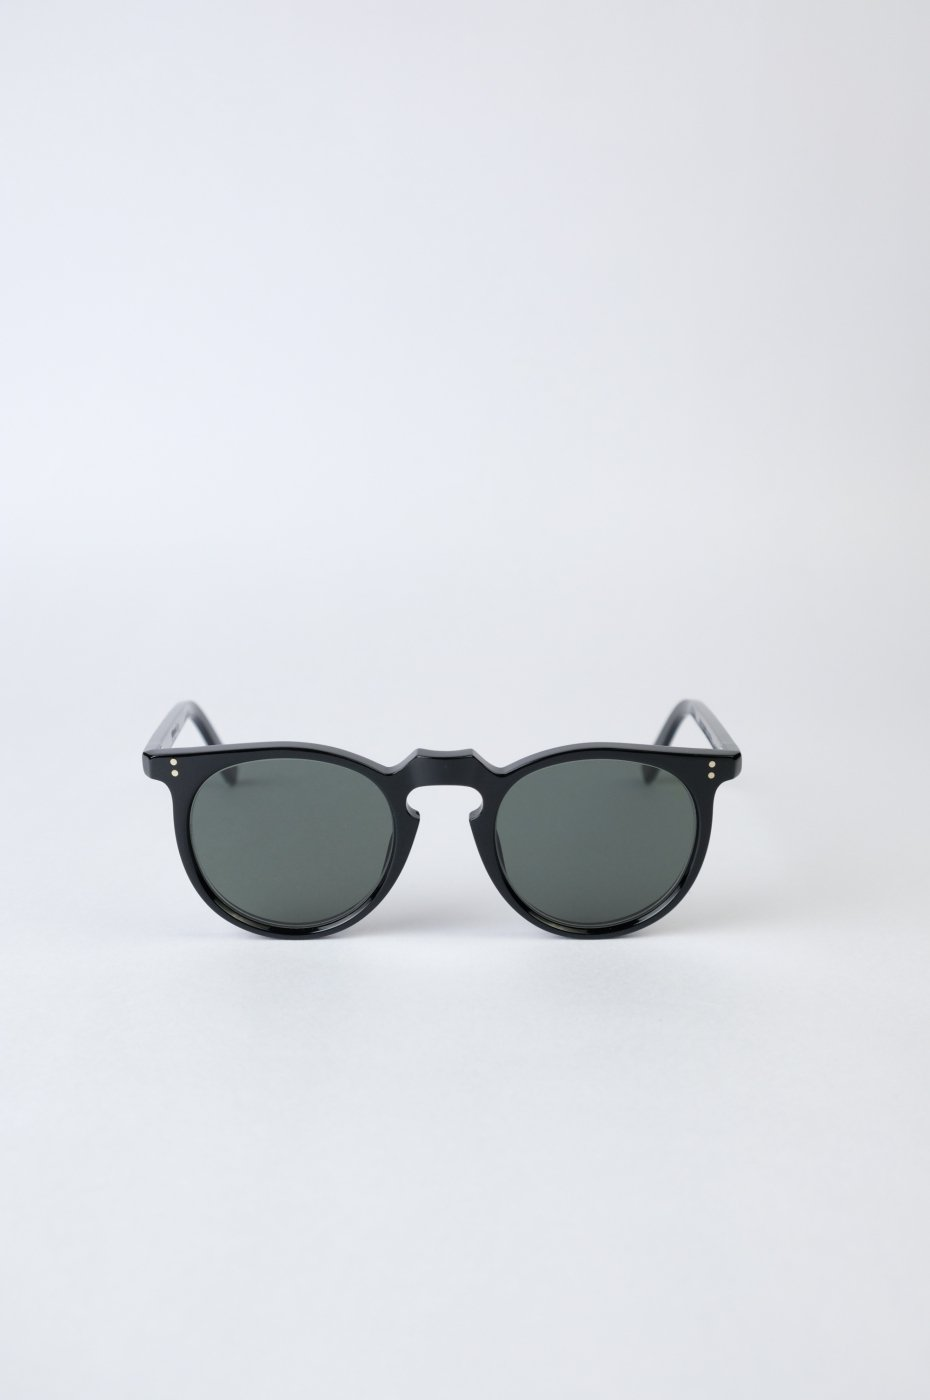 guépard ギュパール-gp-03- Noir-G15 Lens-